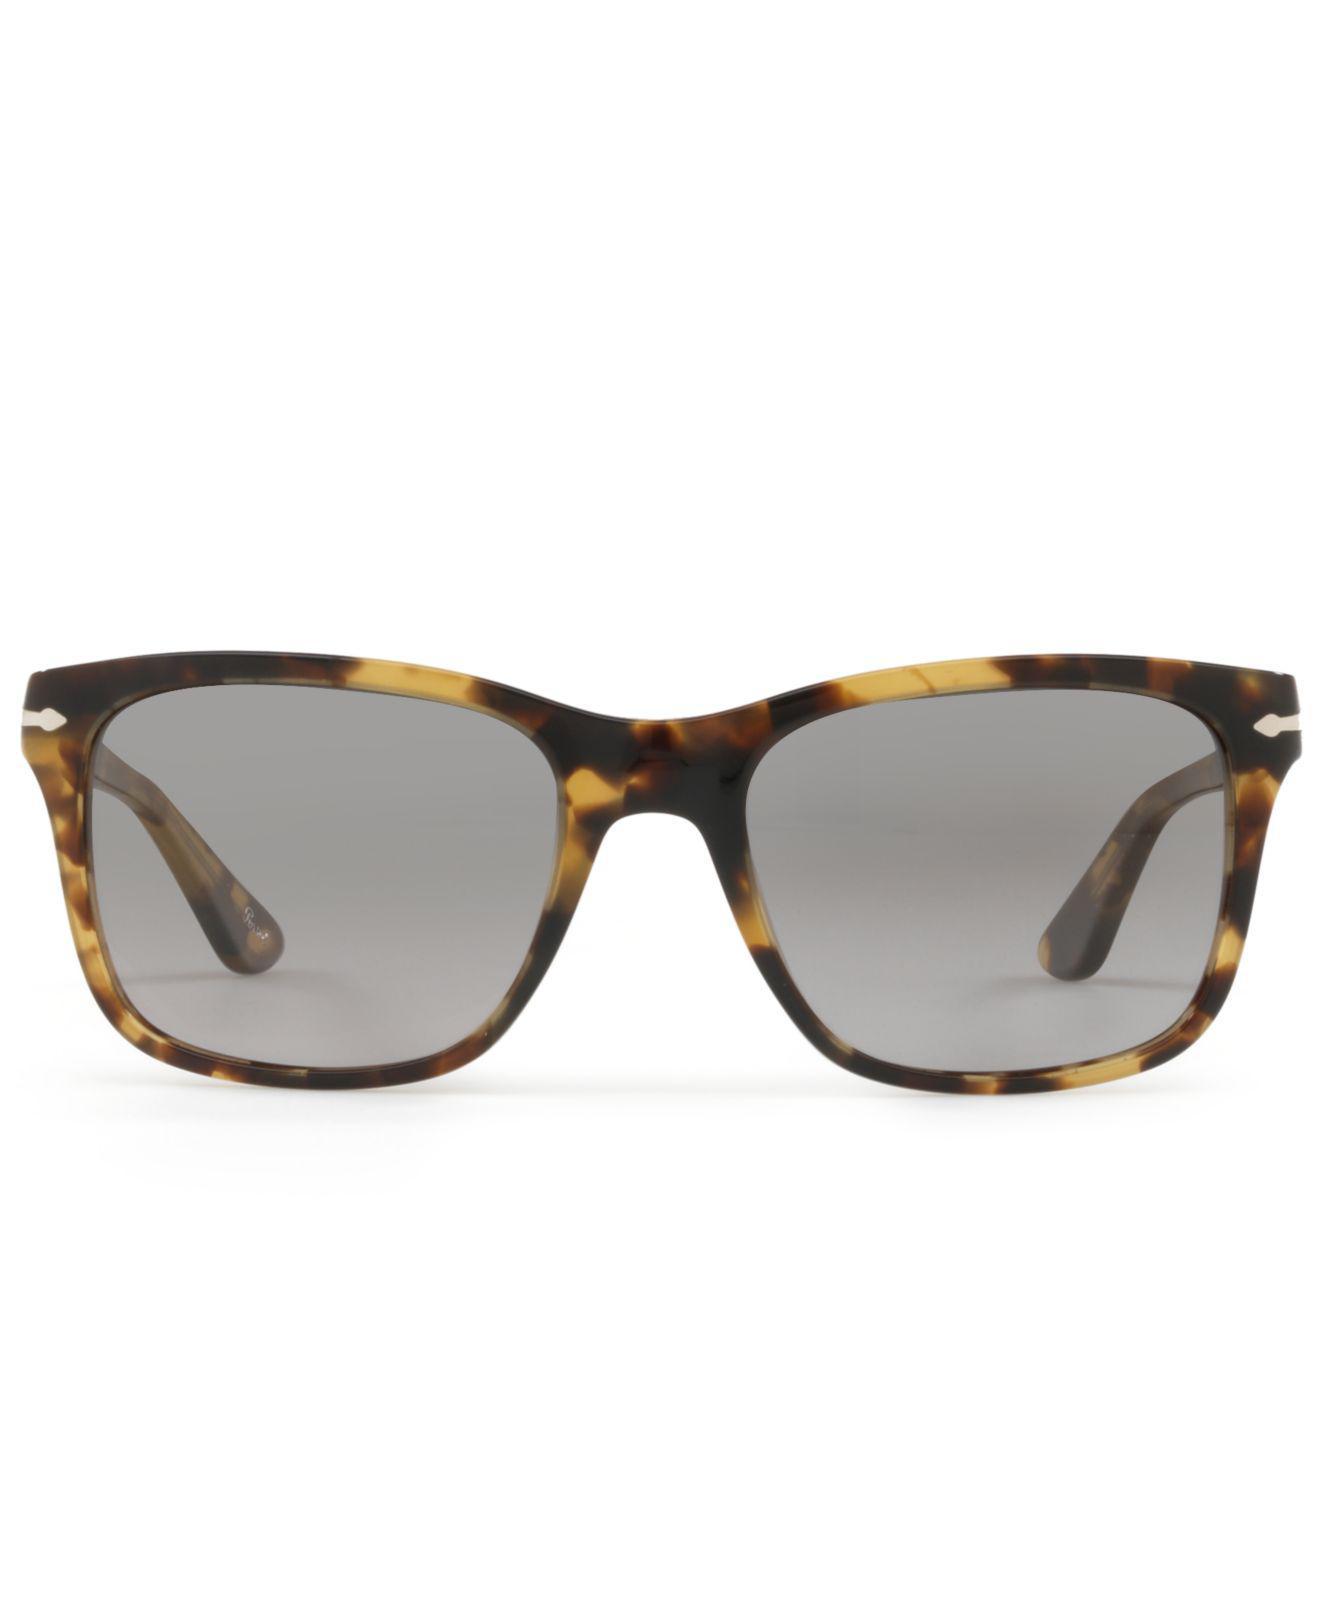 c9790aeb02a0d Persol Sunglasses